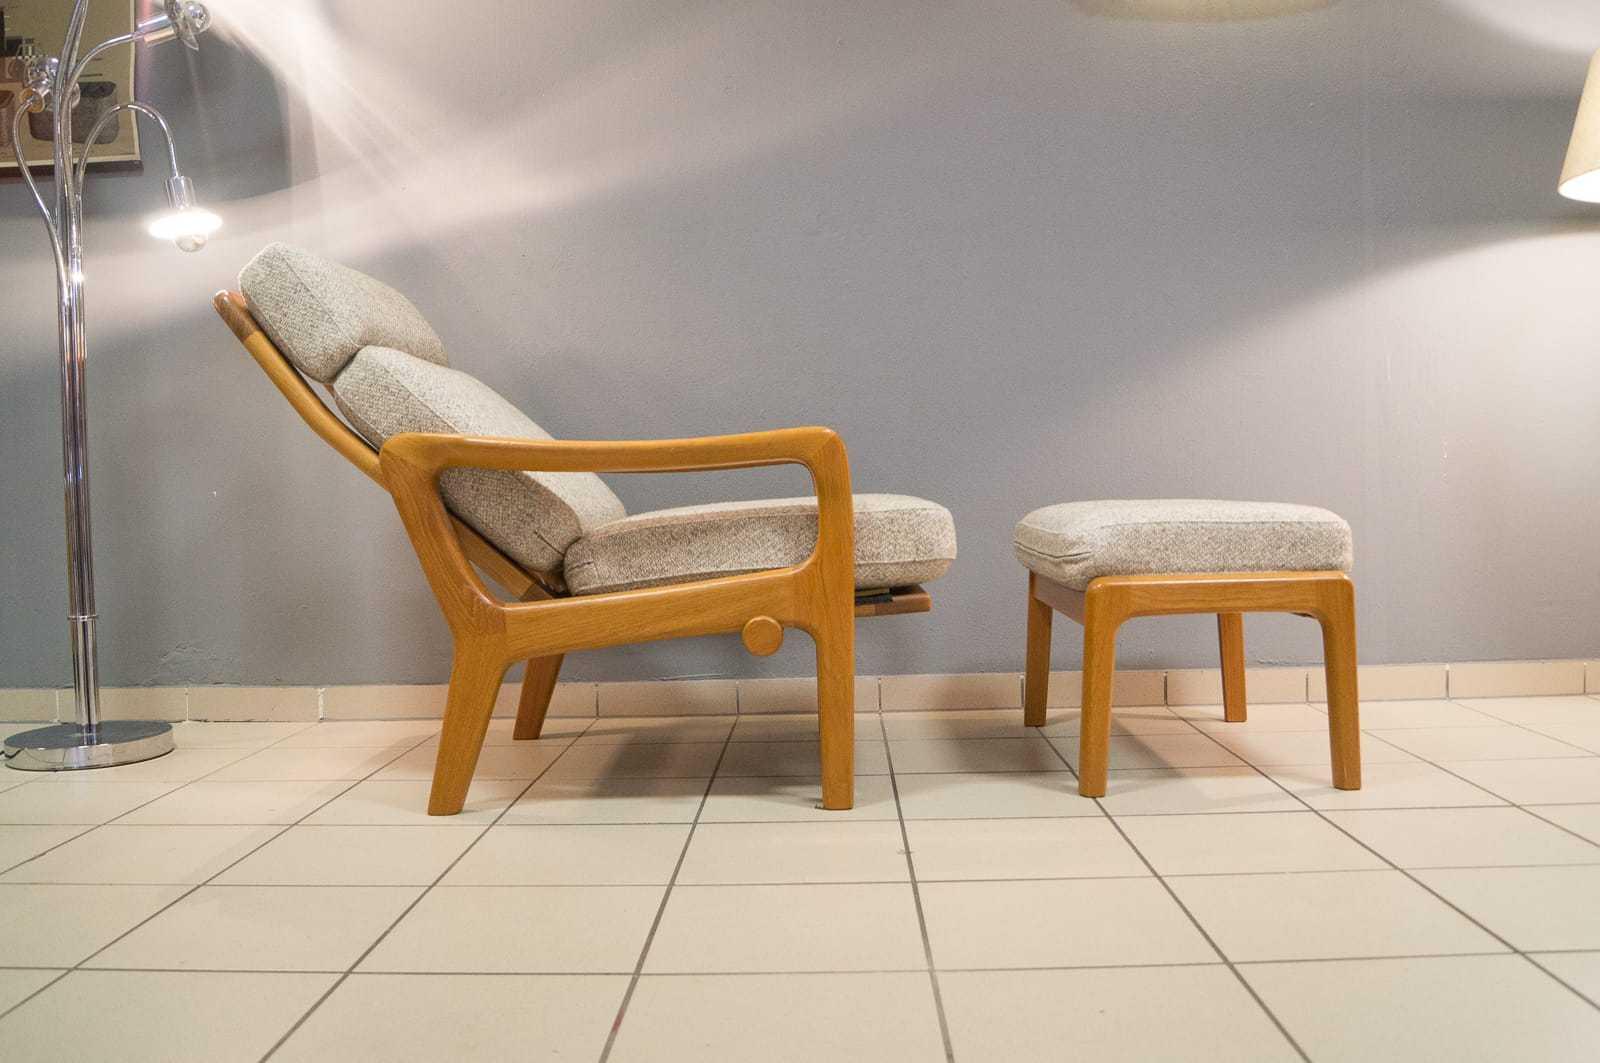 verstellbarer juul kristensen hochlehn sessel mit hocker hochlehner teak vintage. Black Bedroom Furniture Sets. Home Design Ideas